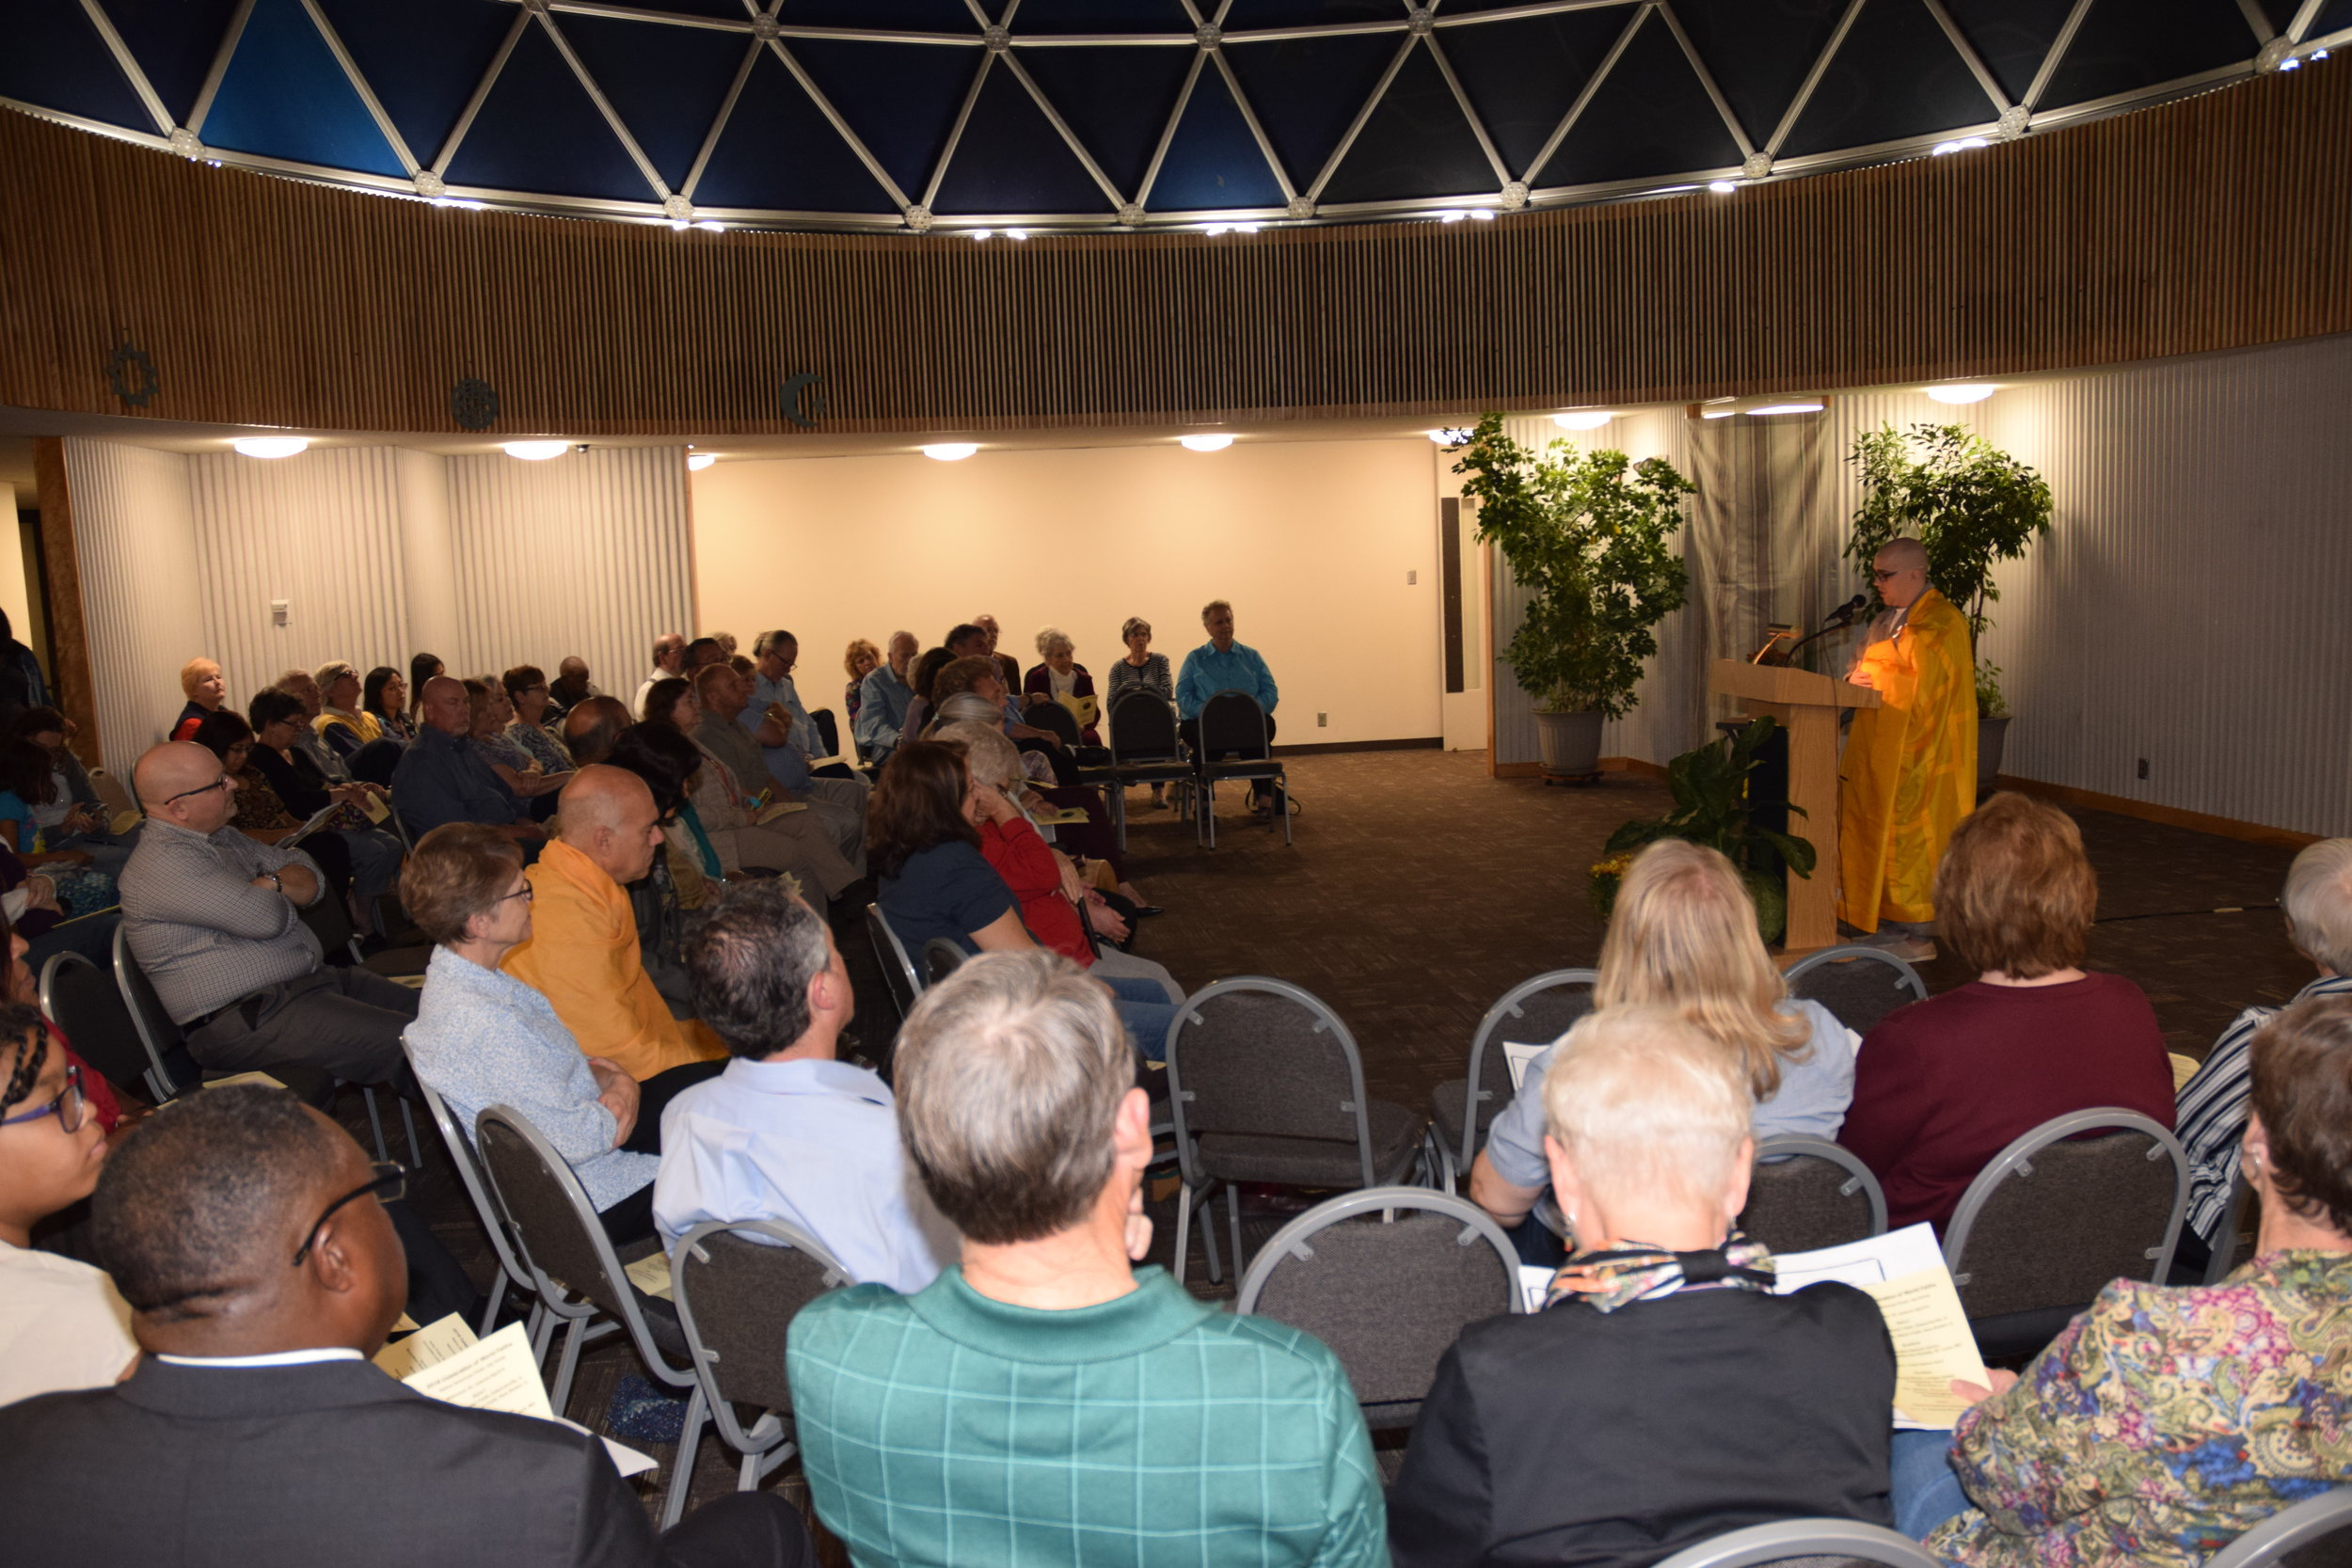 2016 Celebration of World Faiths at the Center for Spirituality & Sustainability